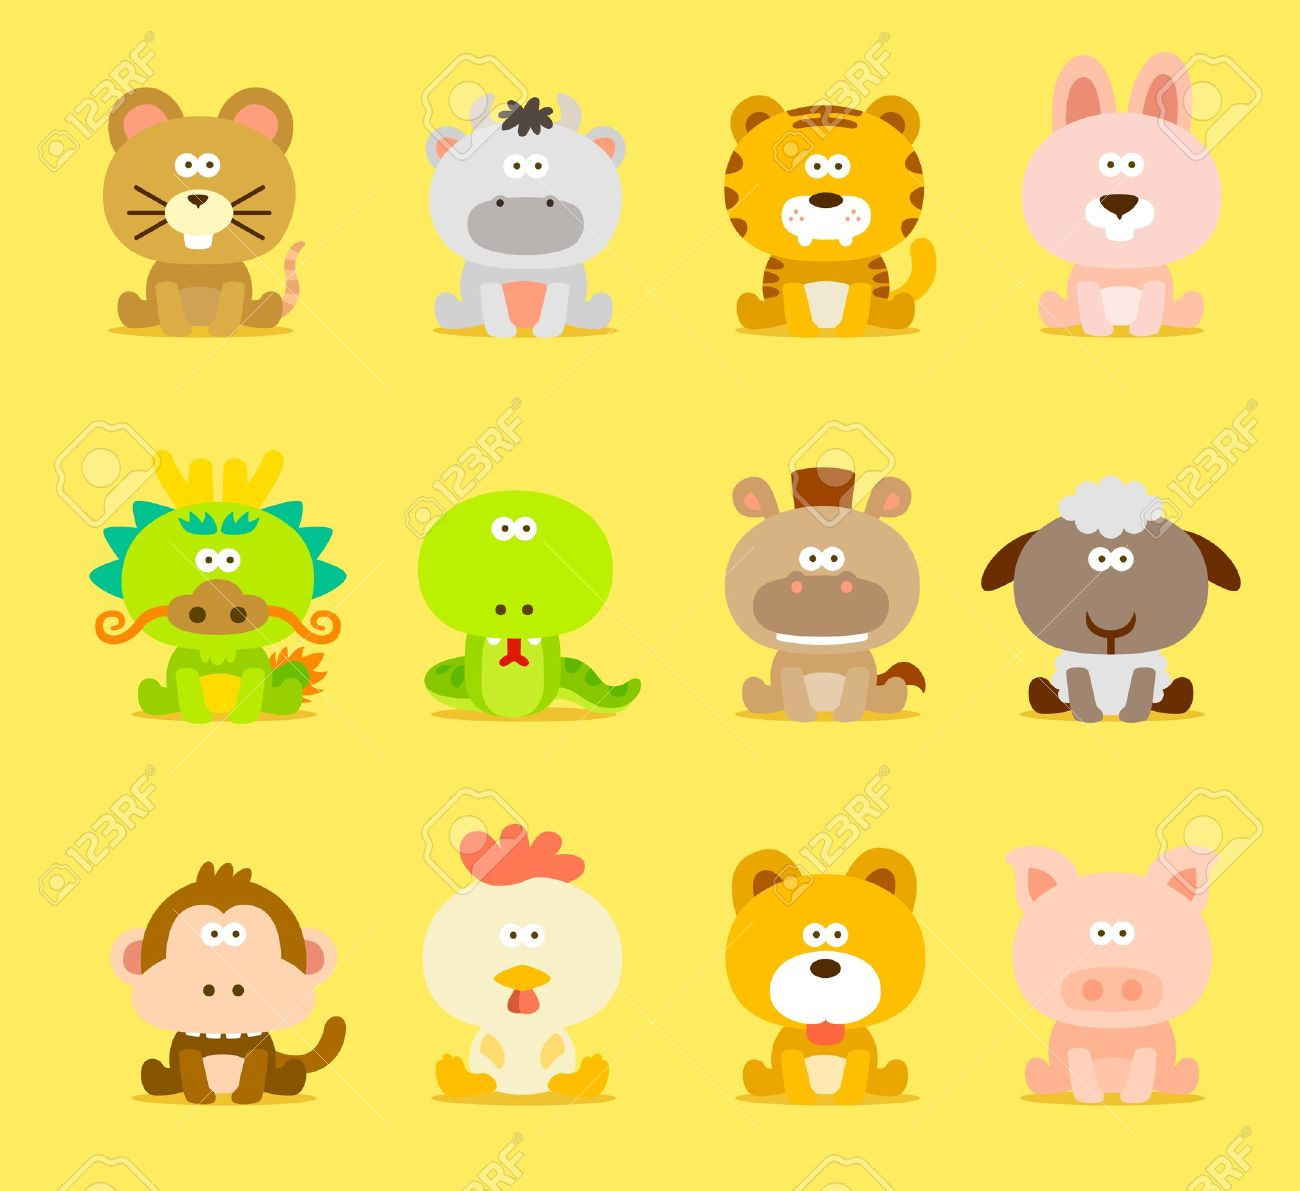 Chinese Zodiac animal ,12 animal icon set.